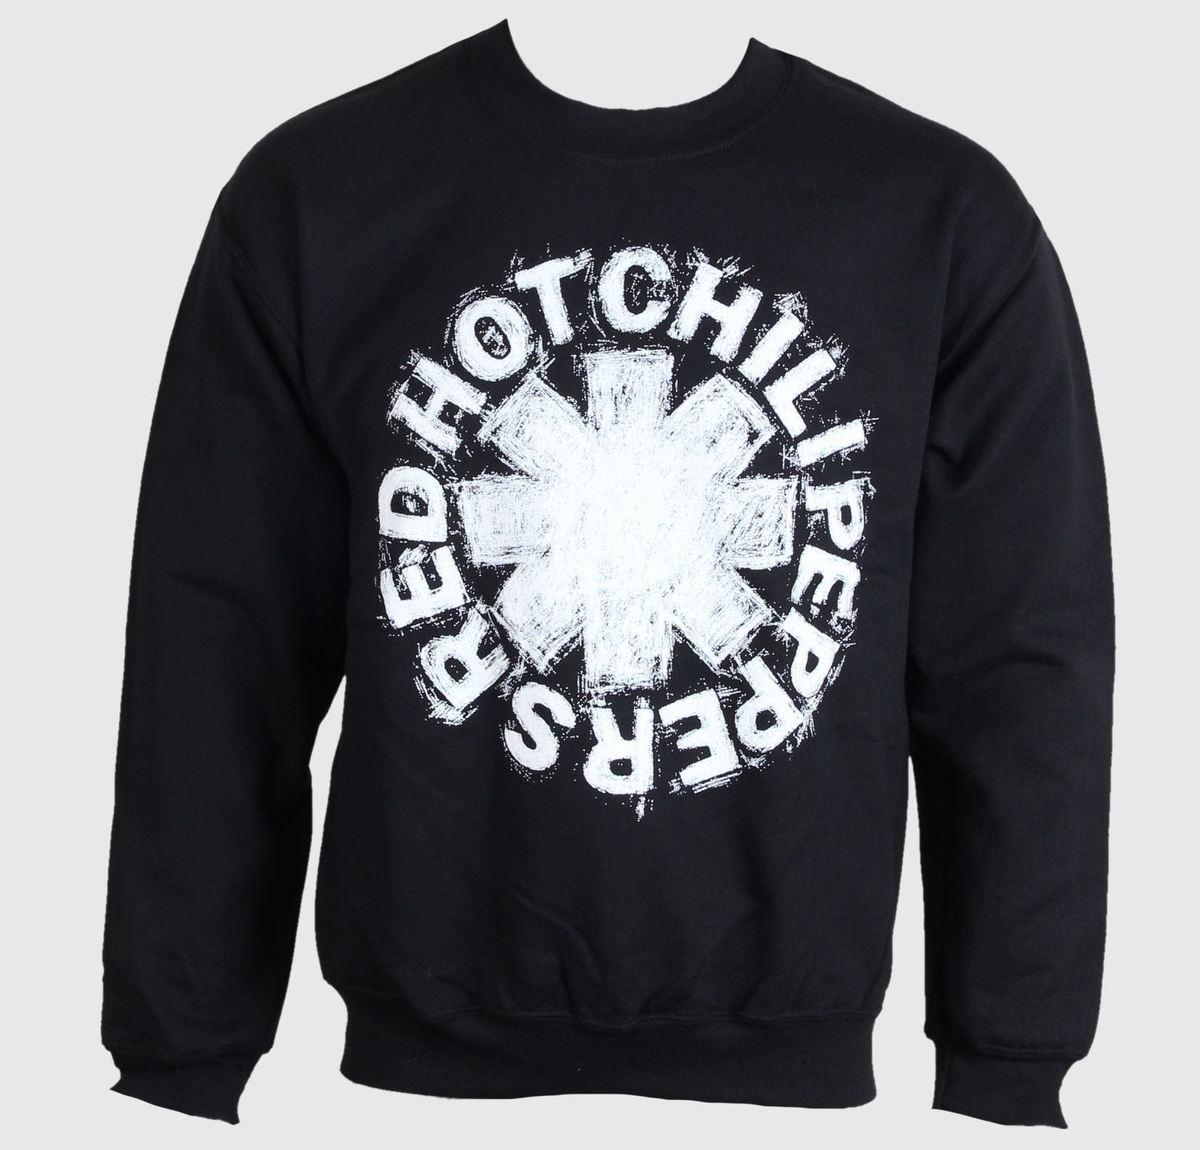 e9062e2b97 pulóver (kapucni nélkül) férfi Red Hot Chili Peppers - Asterisk Sketch -  BRAVADO - 14531267 - Metalshop.hu